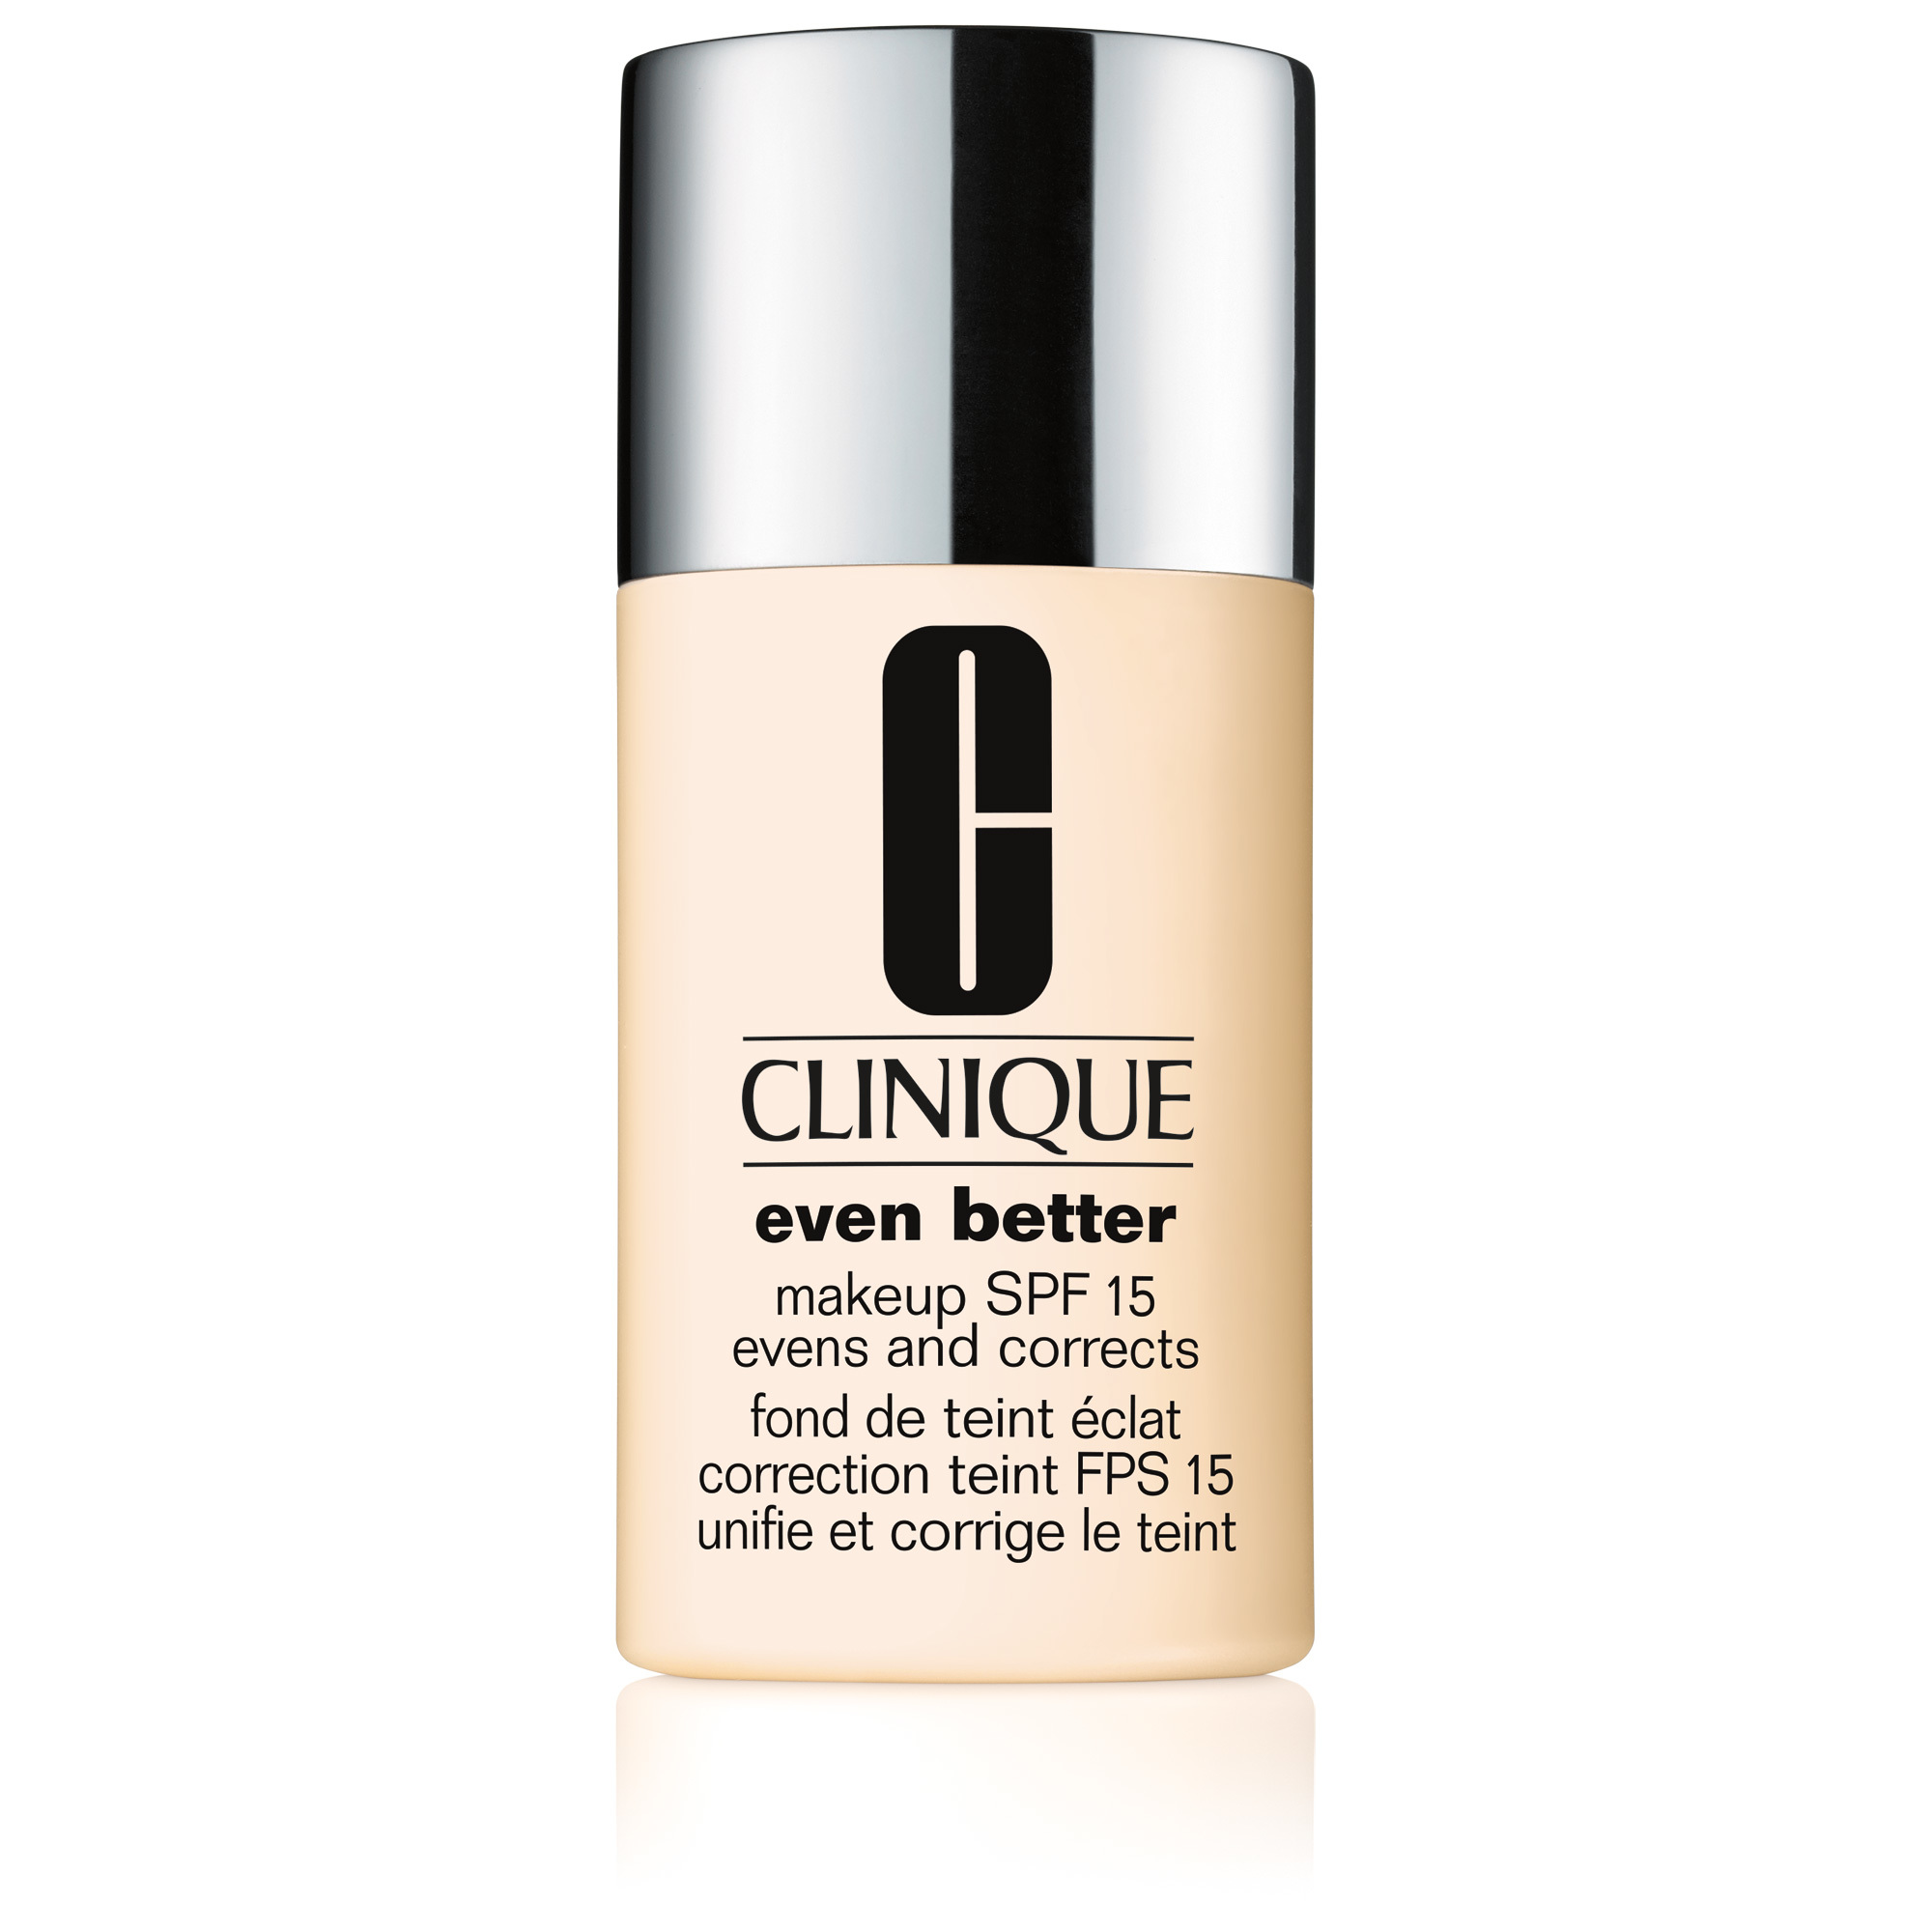 Clinique Even Better Makeup SPF15, 01wn flax